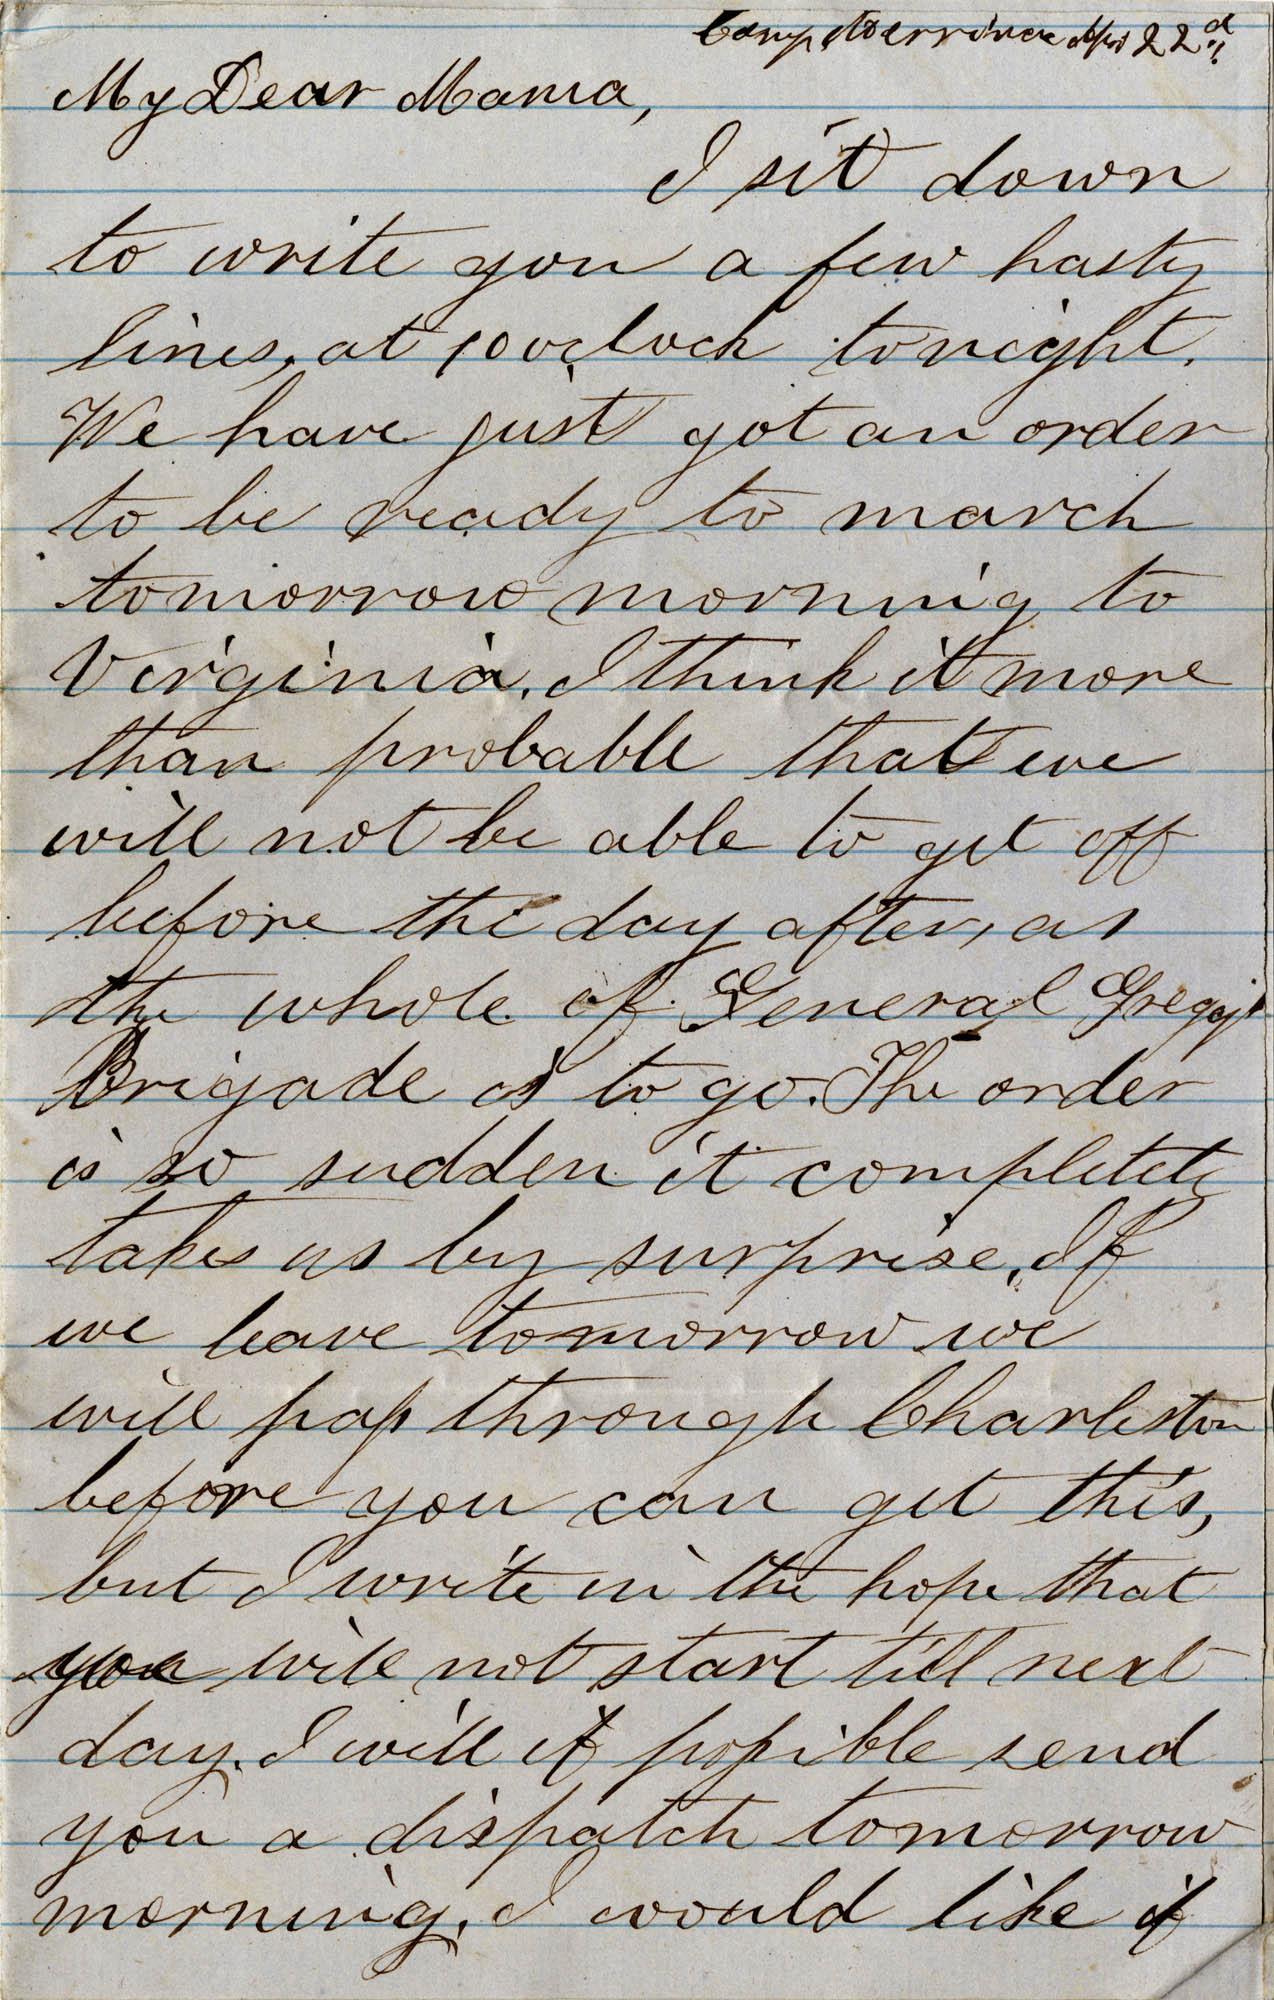 053. Willis Keith to Anna Bella Keith -- [Sept?] 22, 1862.